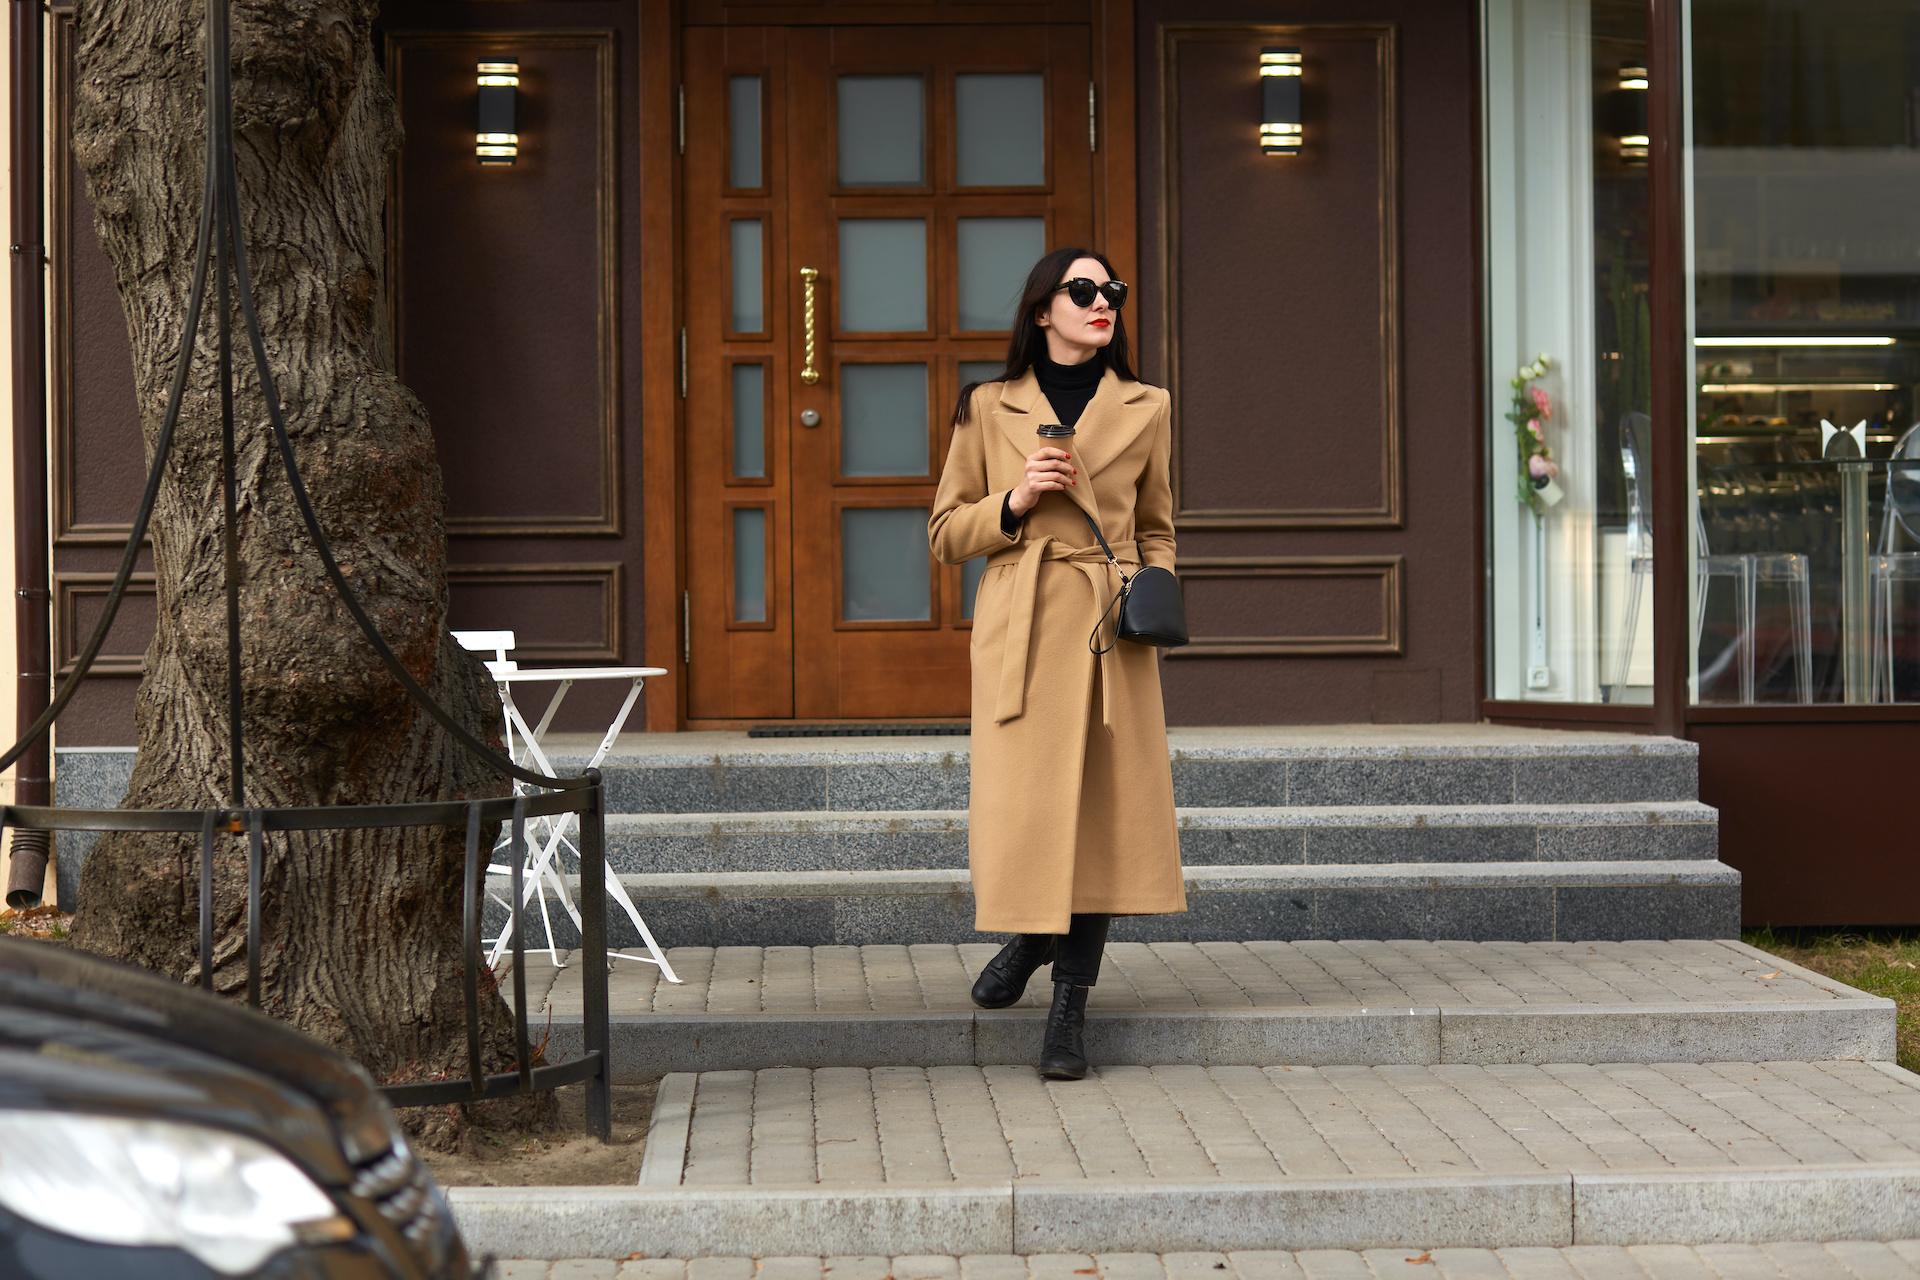 Photo: Sementsova321, Adobe Stock